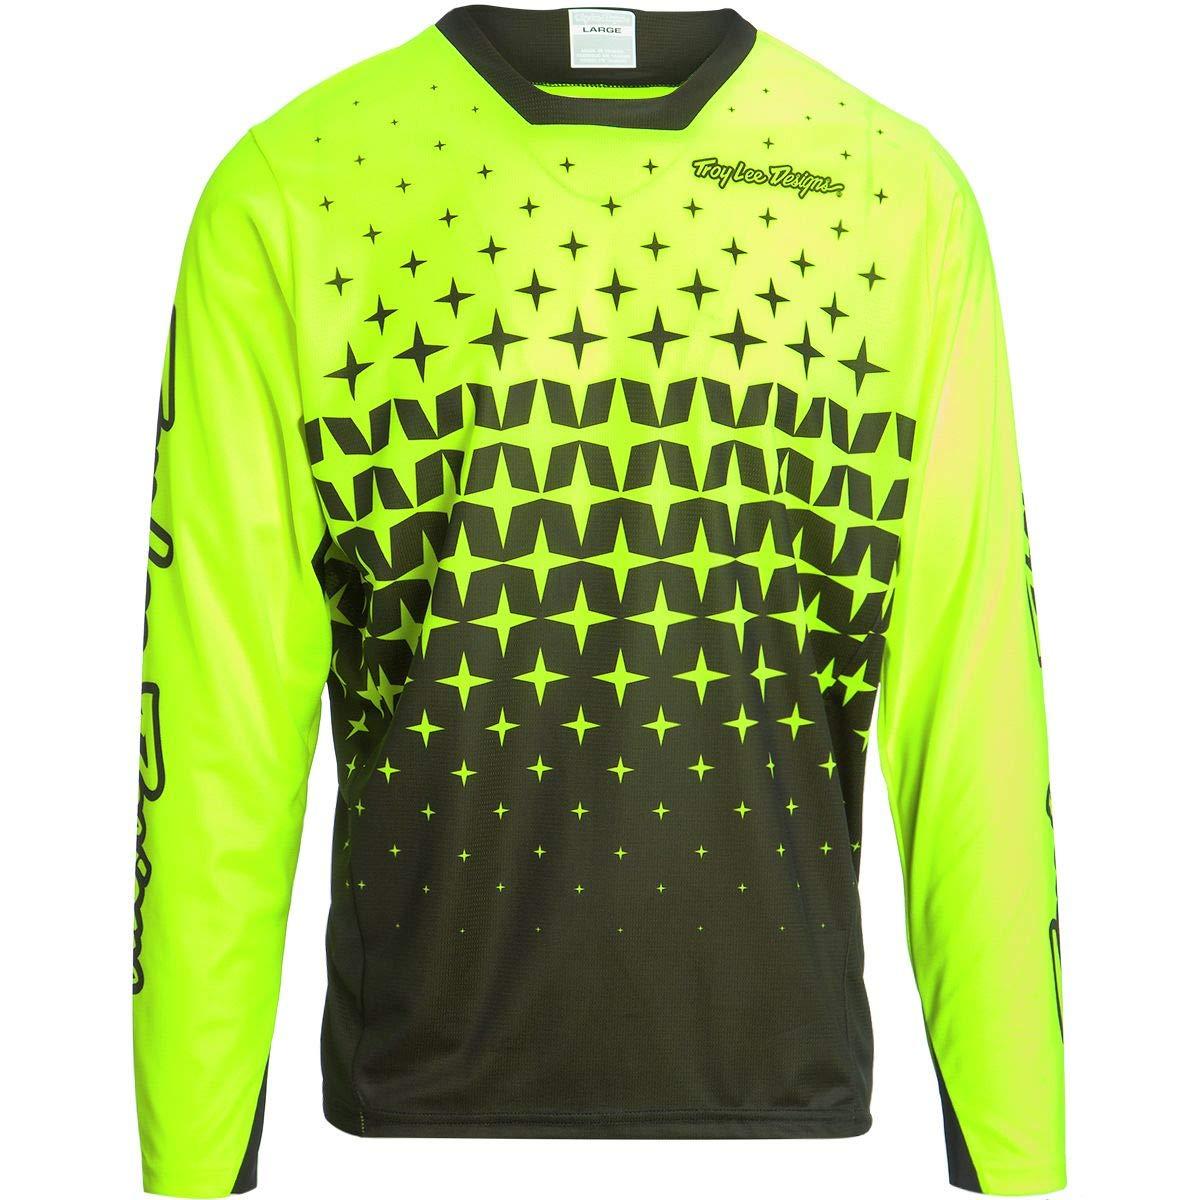 Troy Lee Designs Sprint Jersey - Men's Megaburst Flo Yellow/Black, S